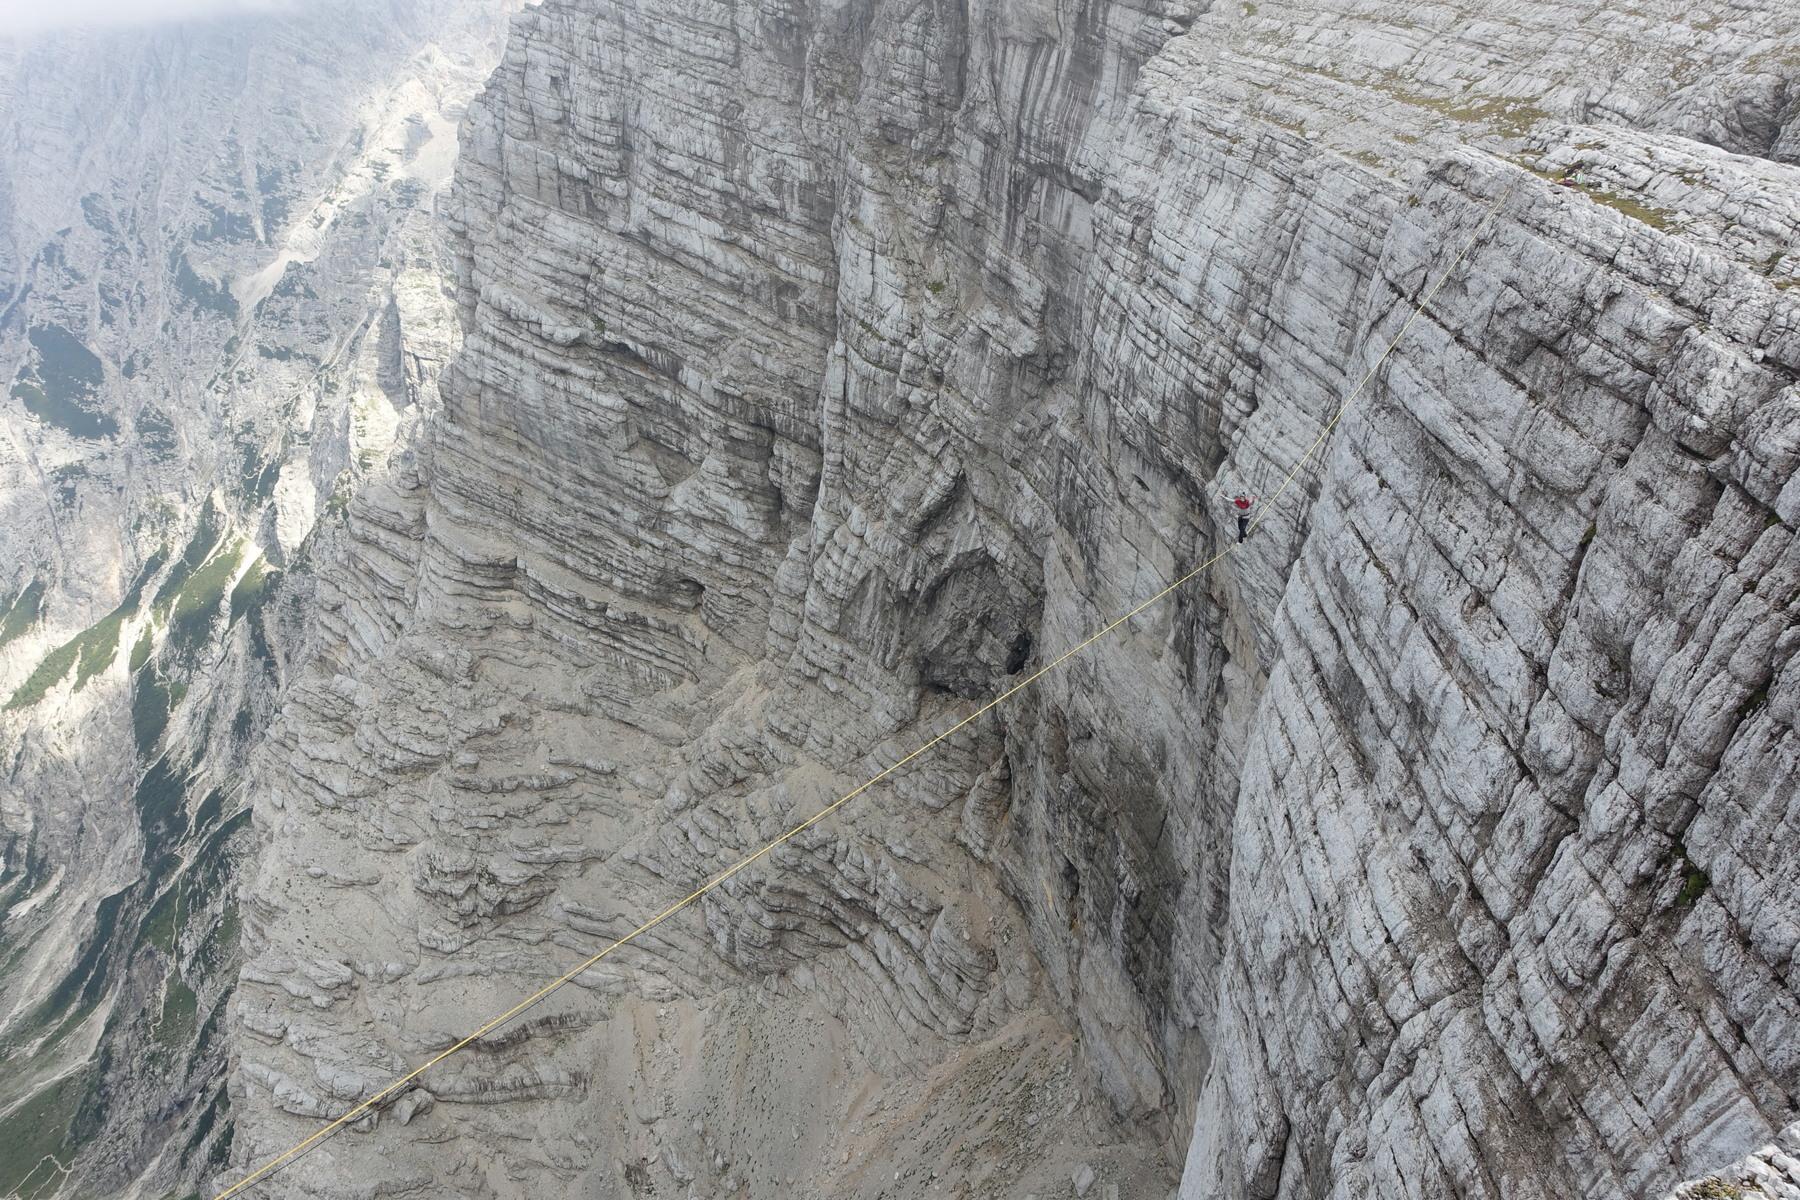 Balansa_Slackline-Triglav Highline